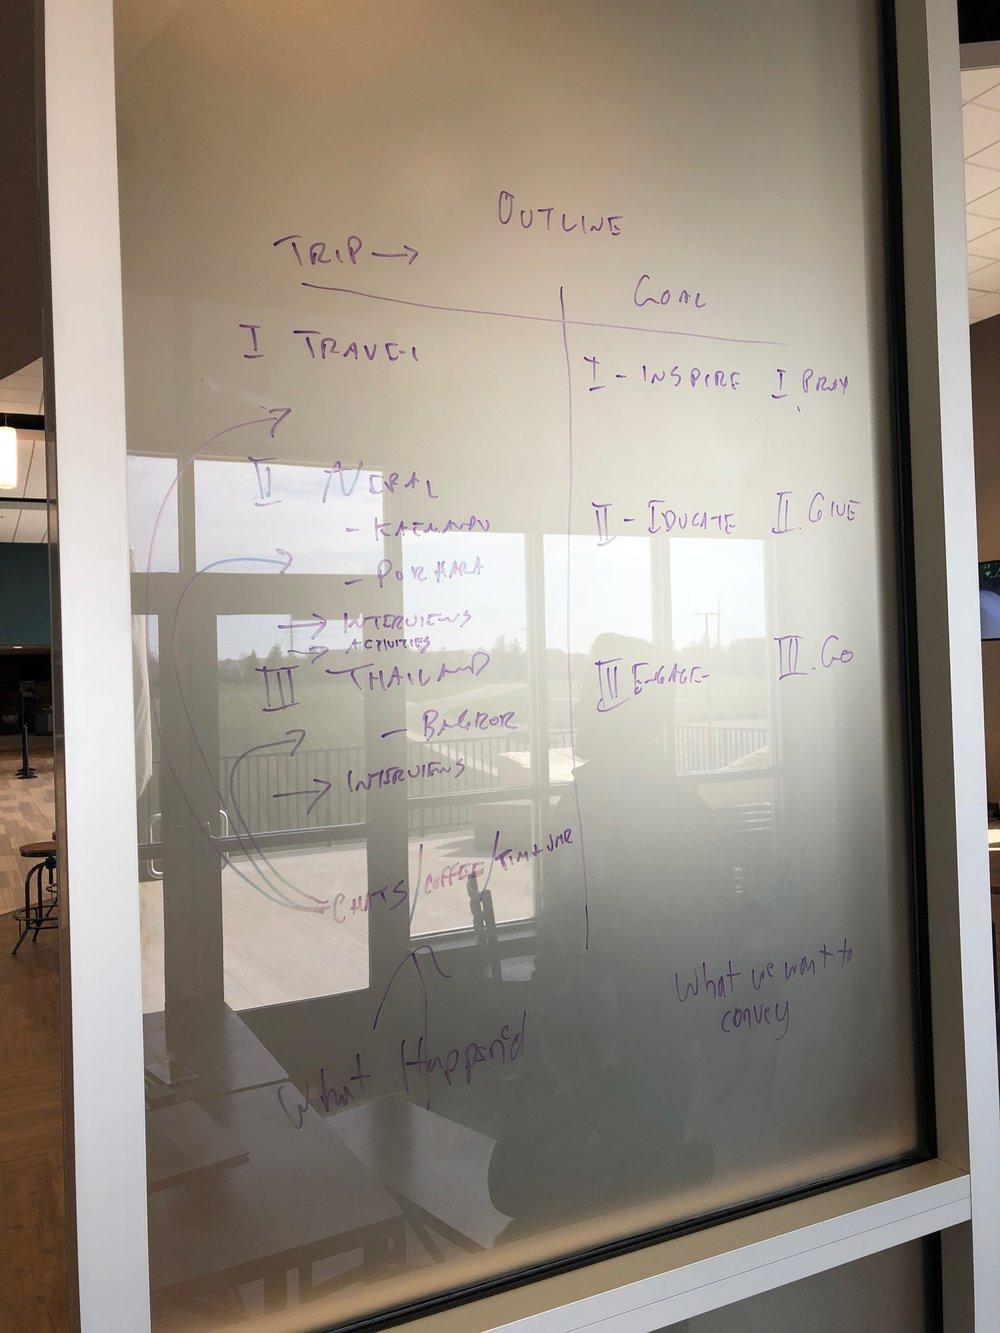 Planning outline